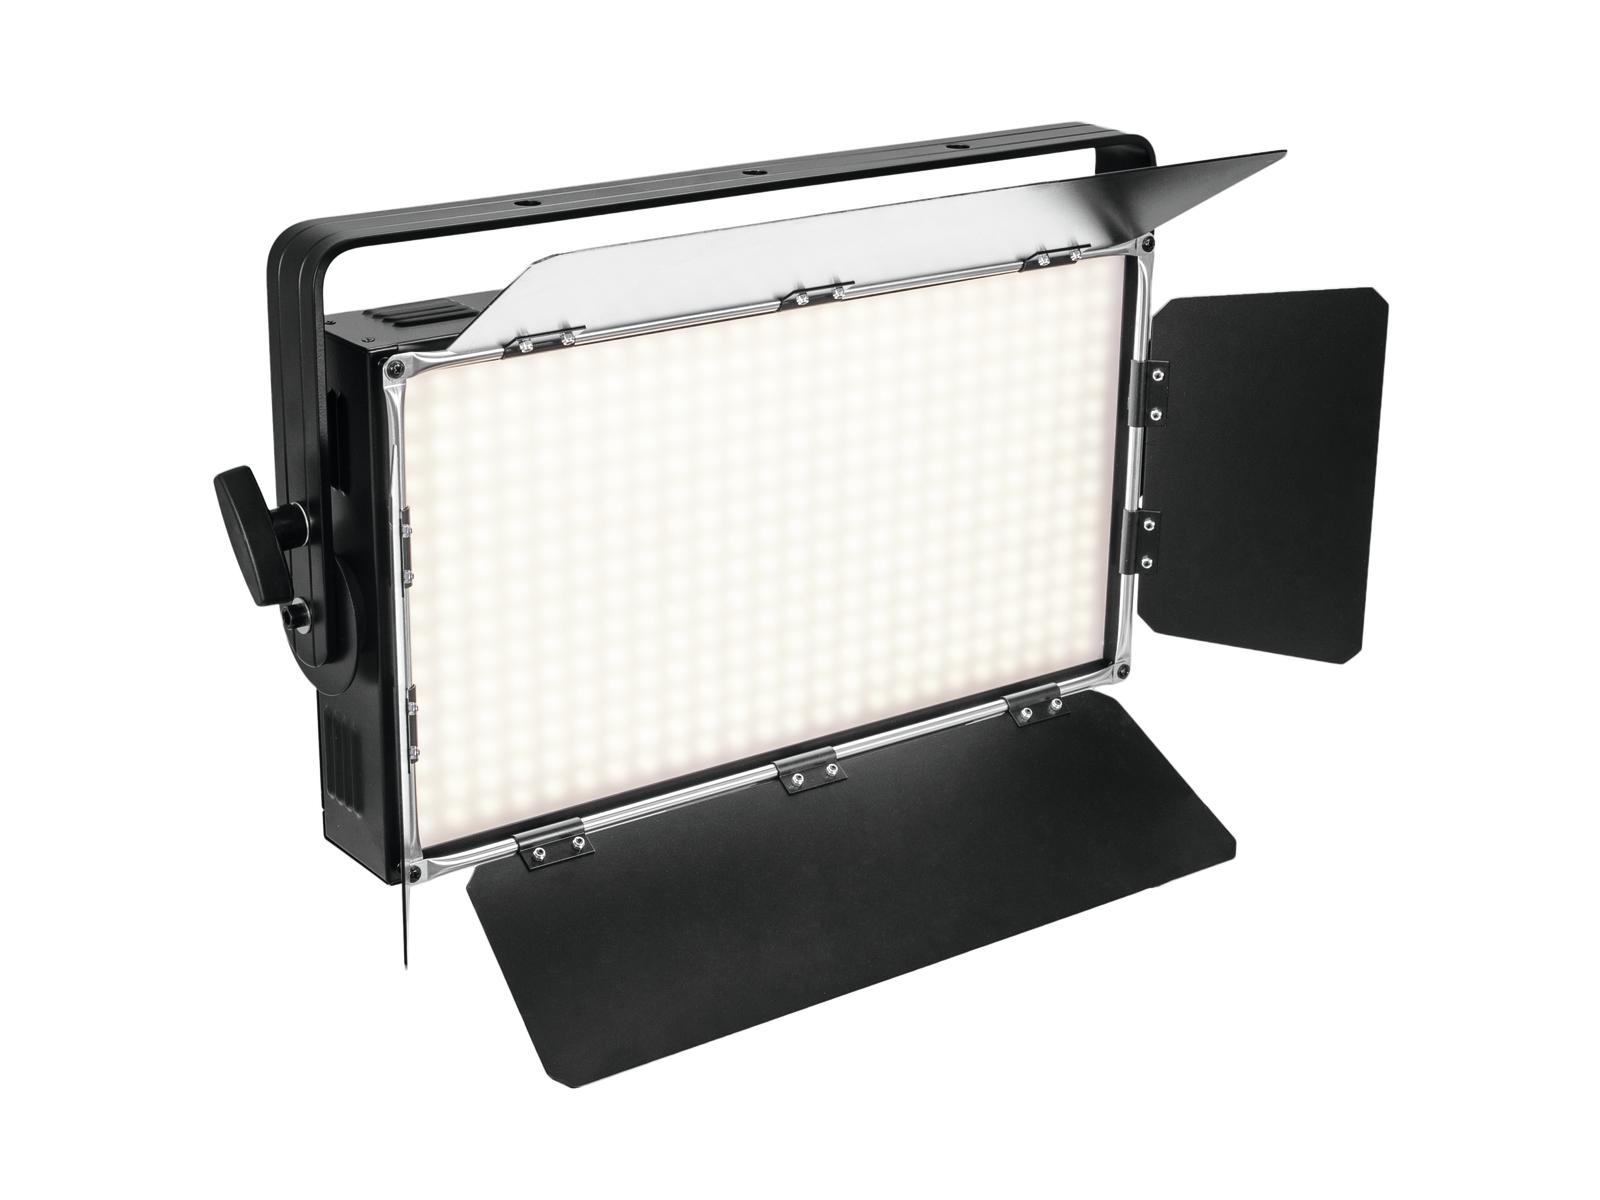 Eurolite LED PLL-360 LED reflektor, 3200K